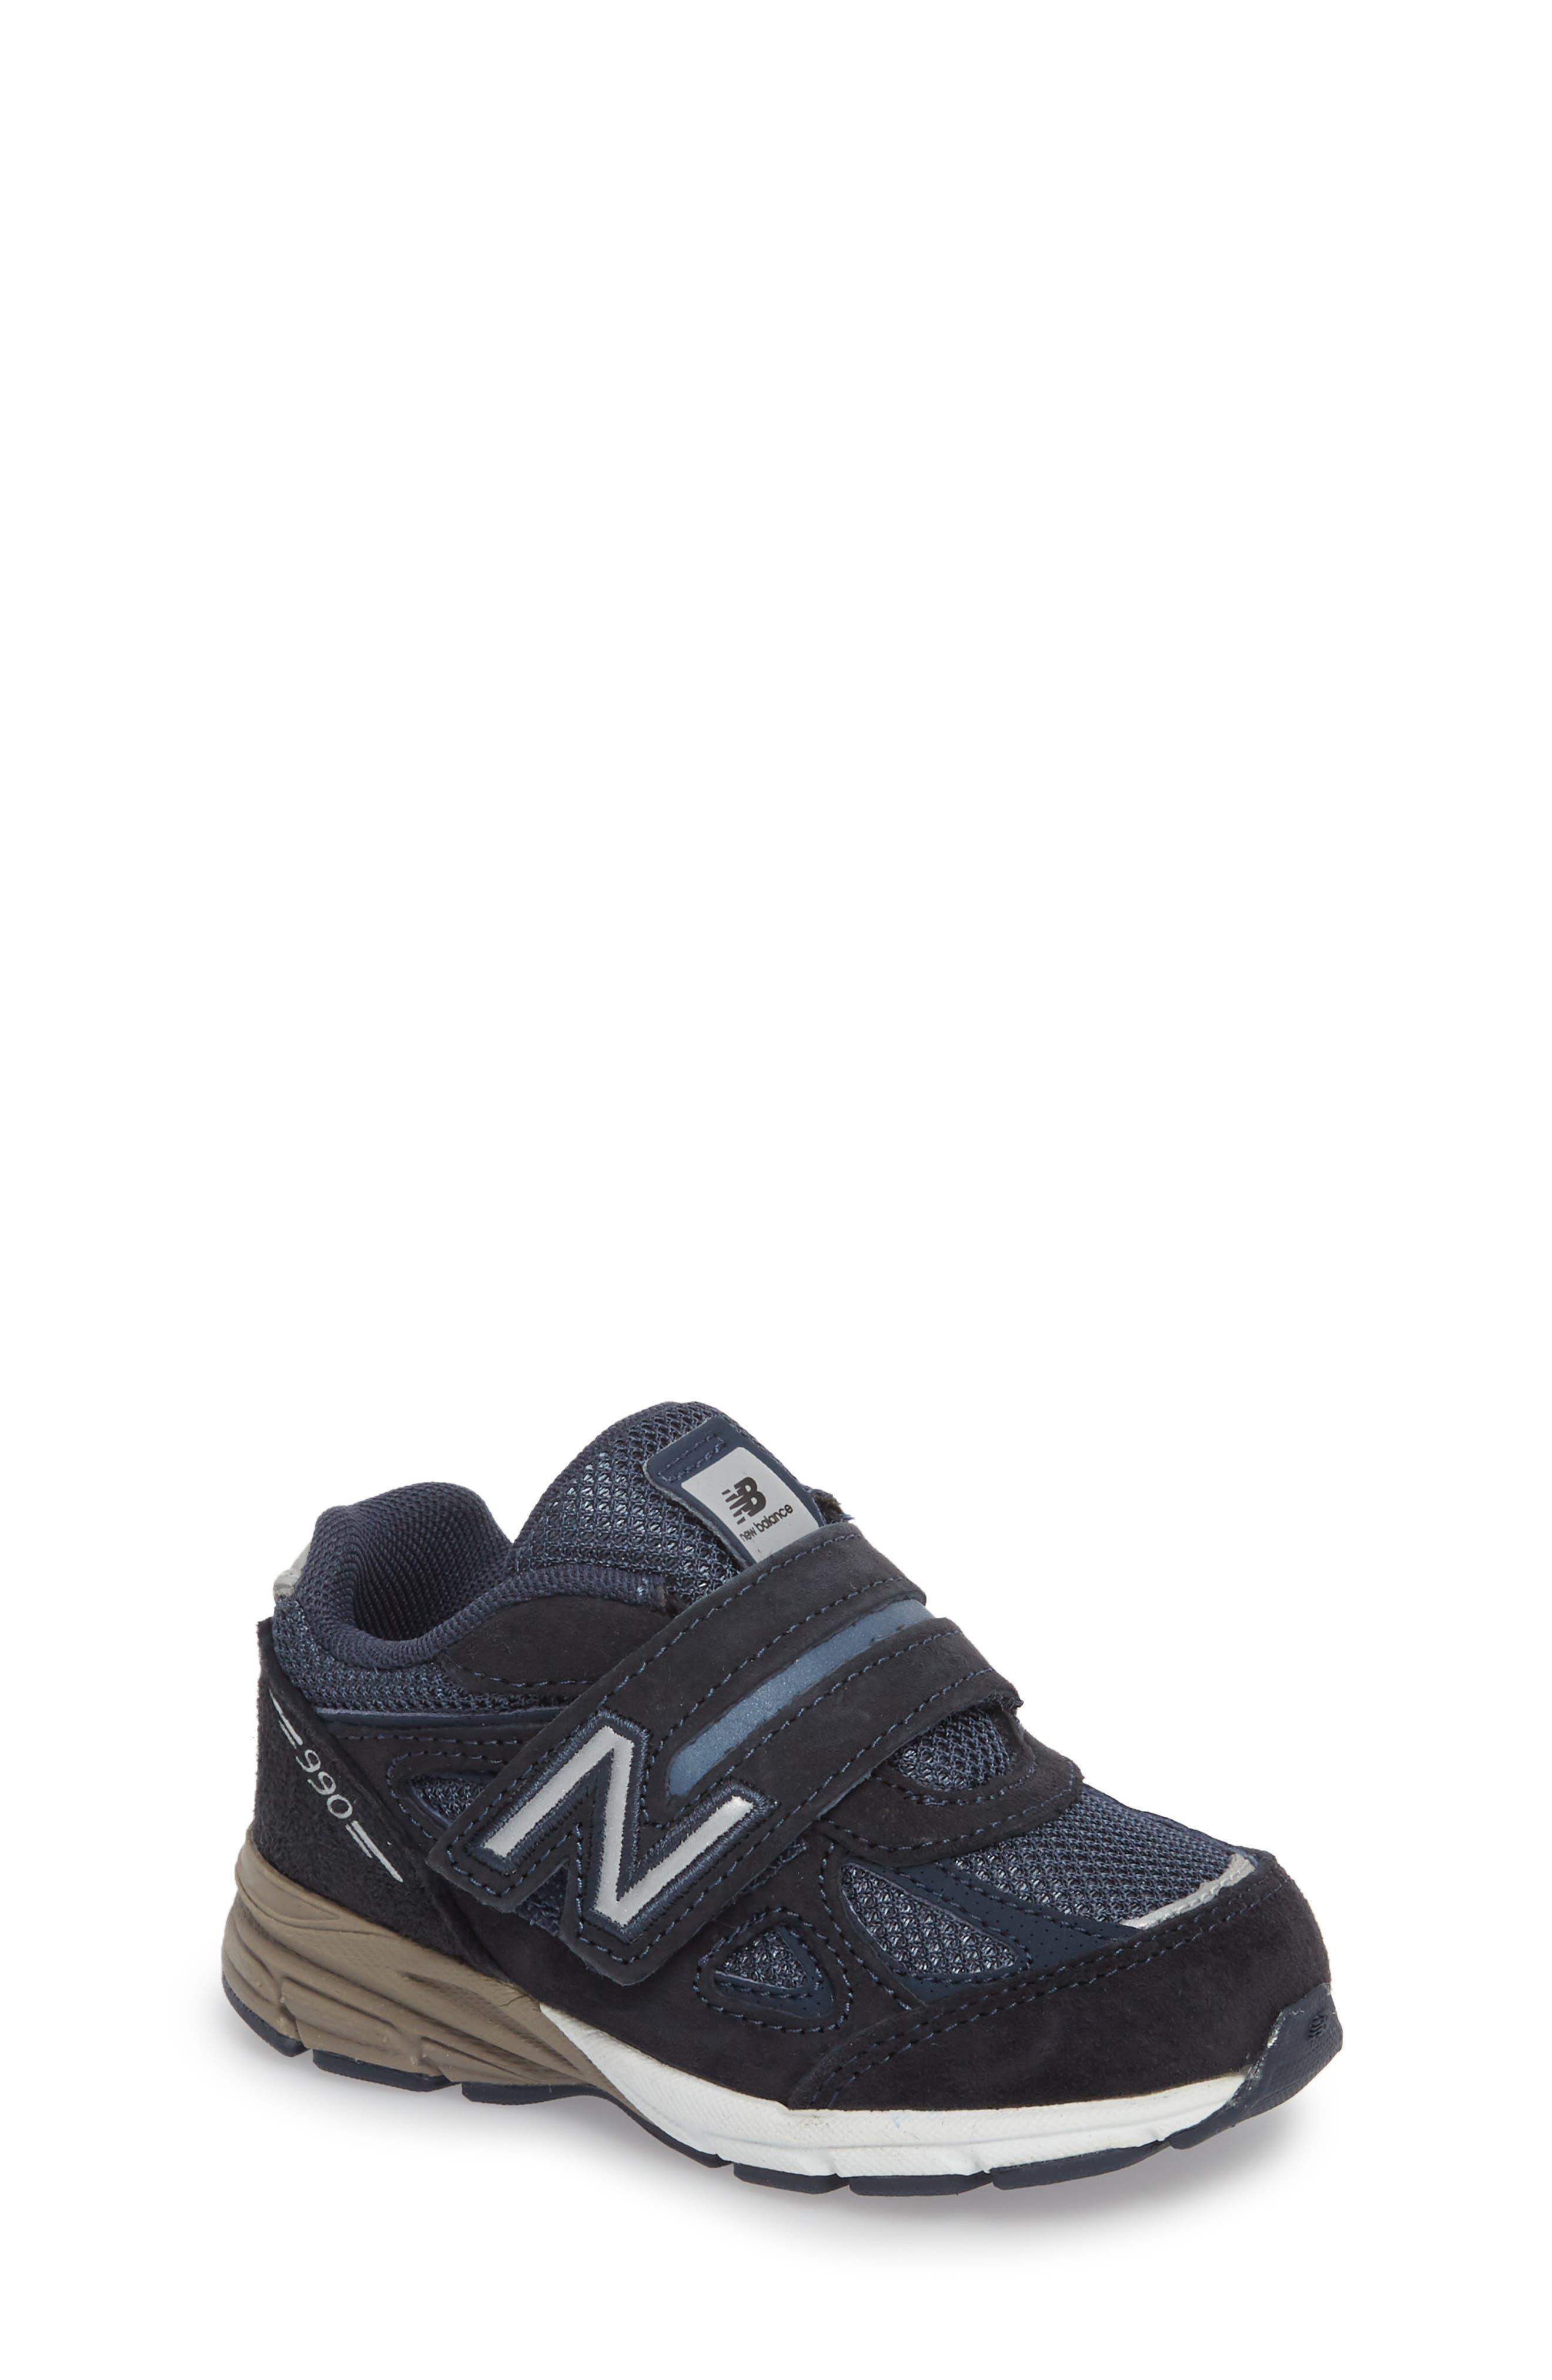 990v4 Sneaker,                             Main thumbnail 1, color,                             410